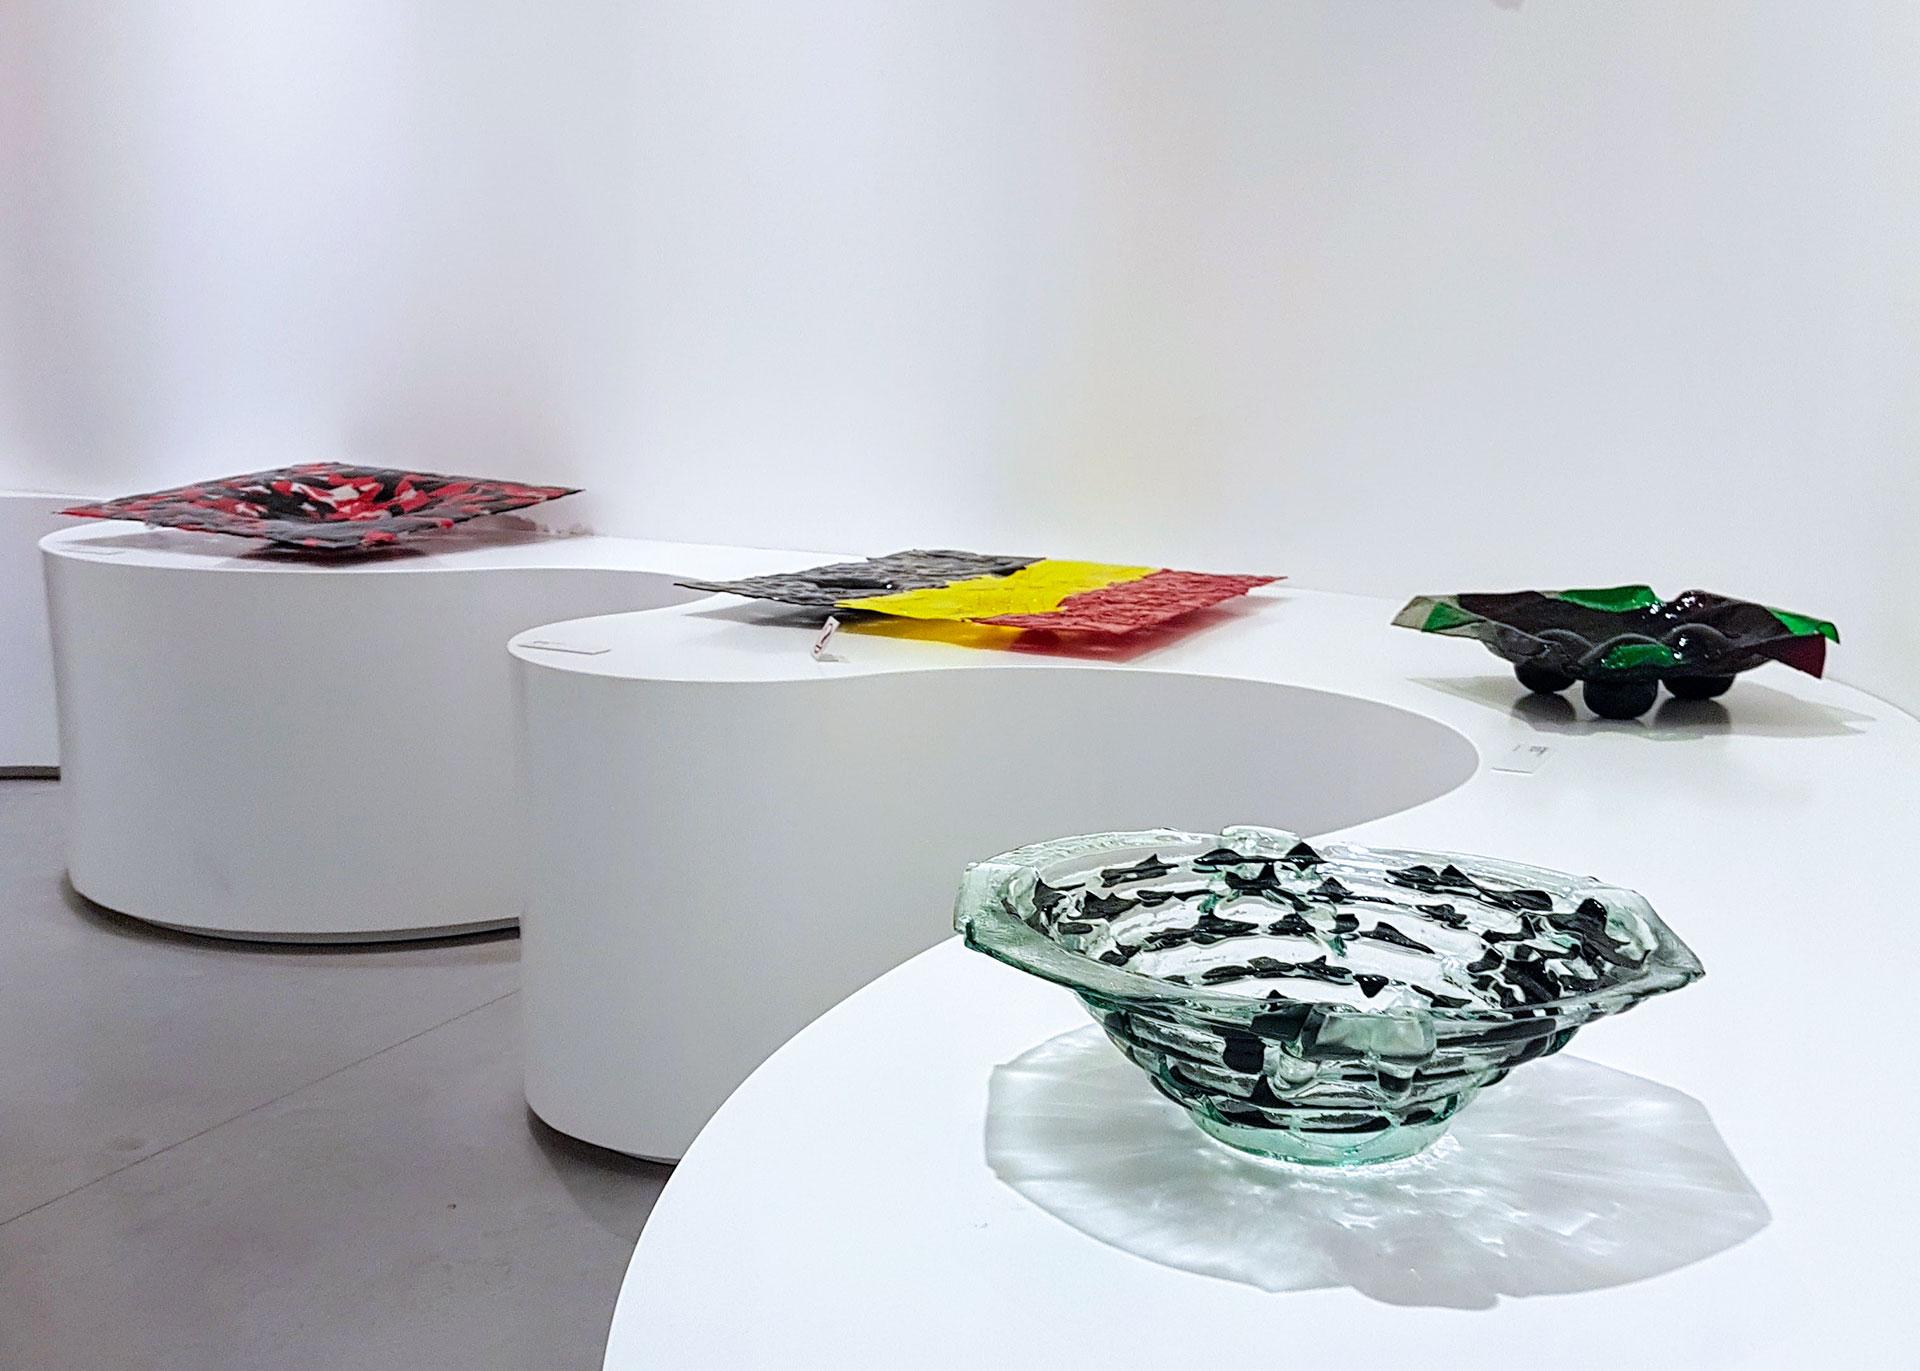 Gaetano Pesce, Biennale Venedig, Ausstellung, Glas, Glasobjekte, experimentelle Glaskunst, Murano